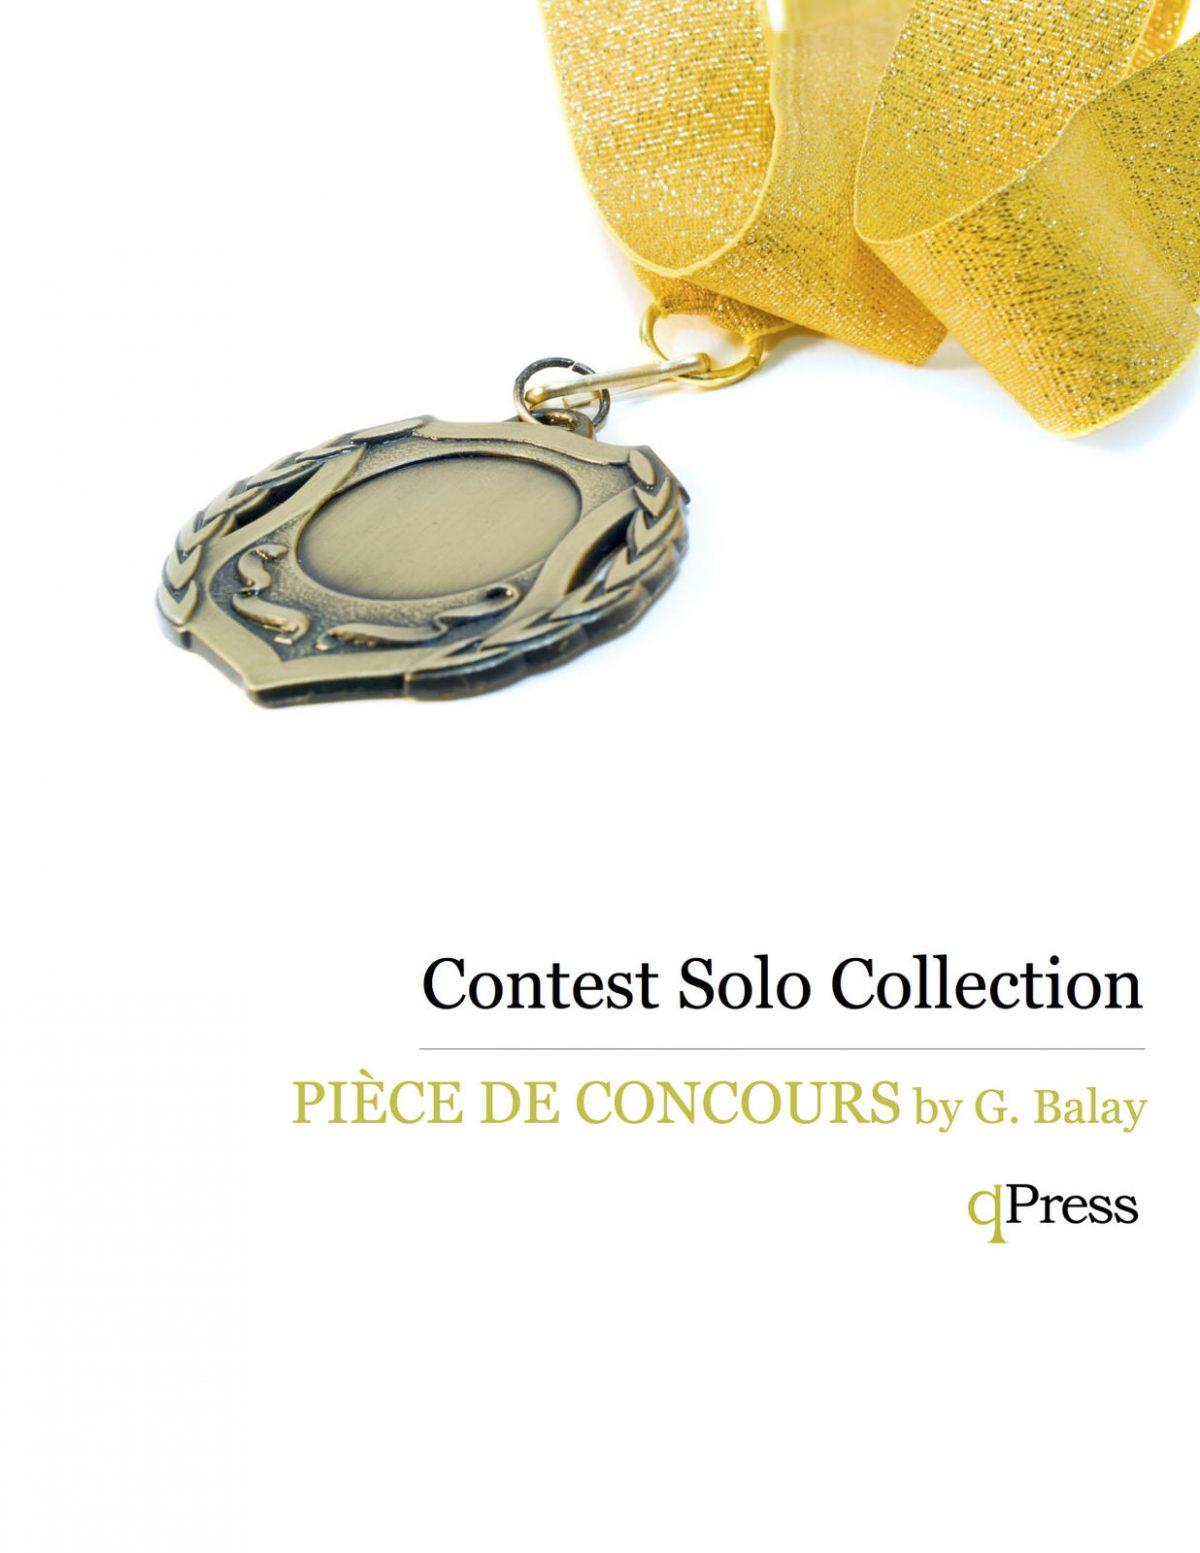 Balay, Piece de Concours